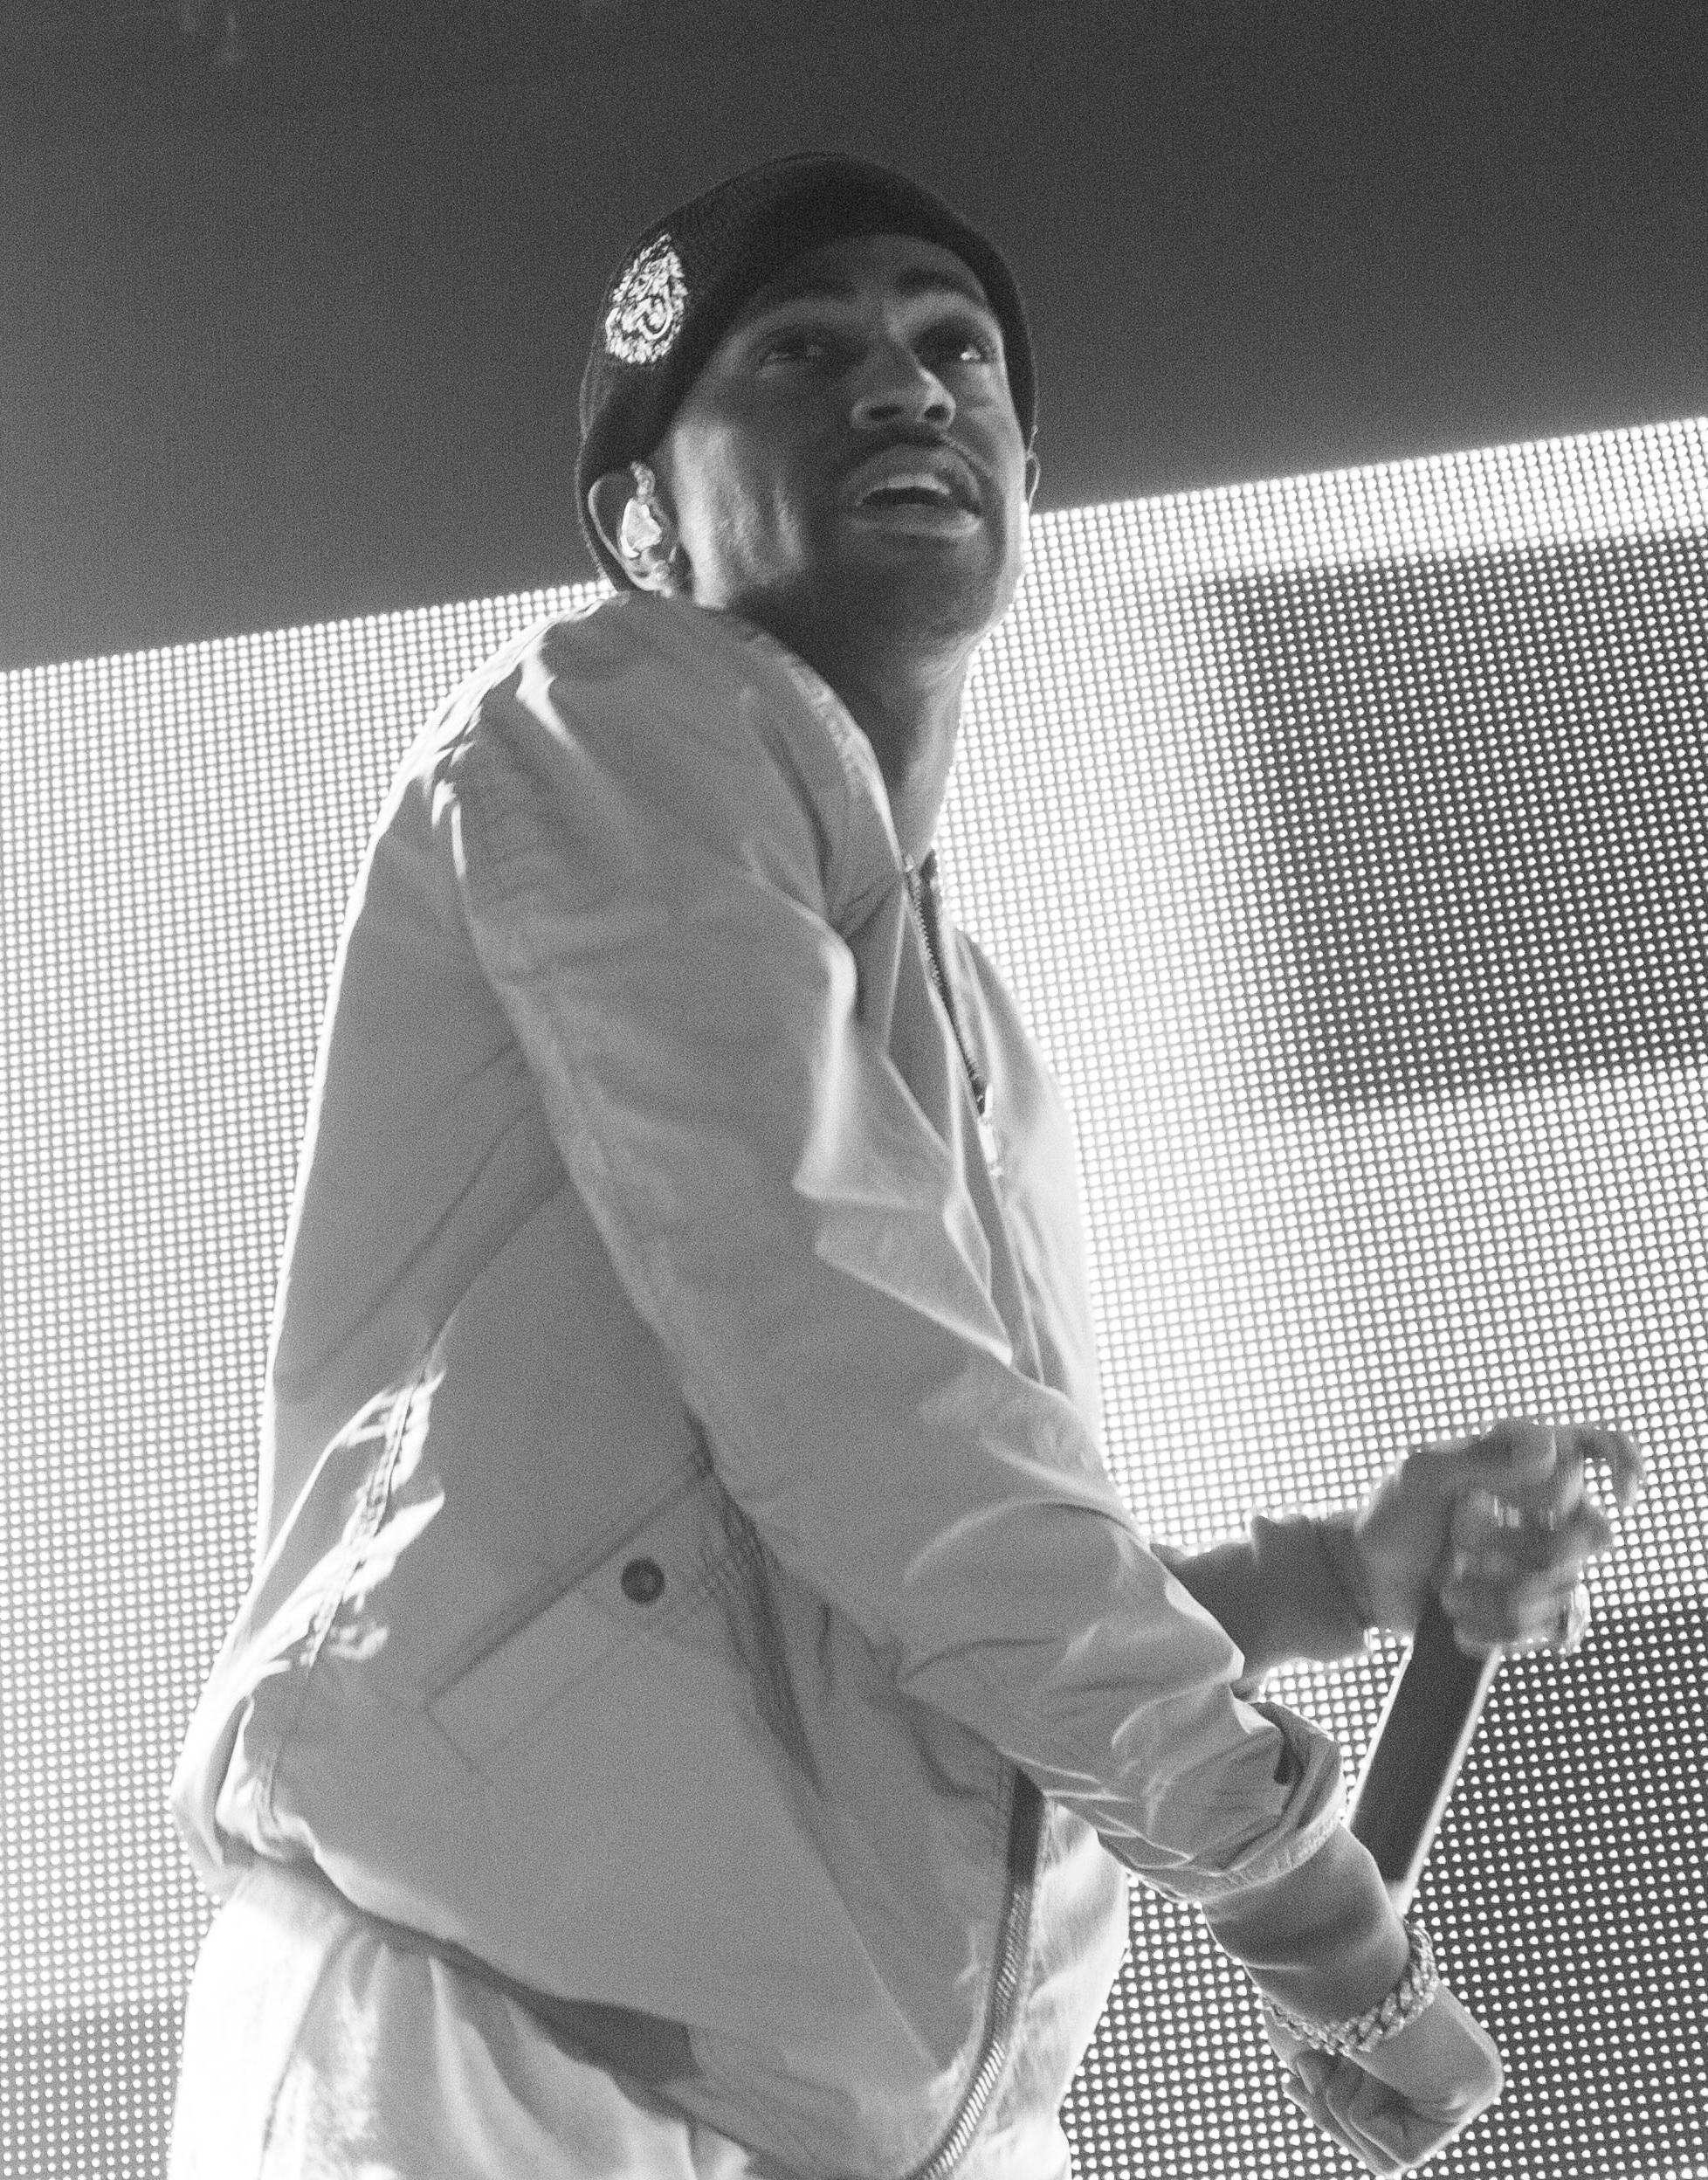 Big Sean discography - Wikipedia